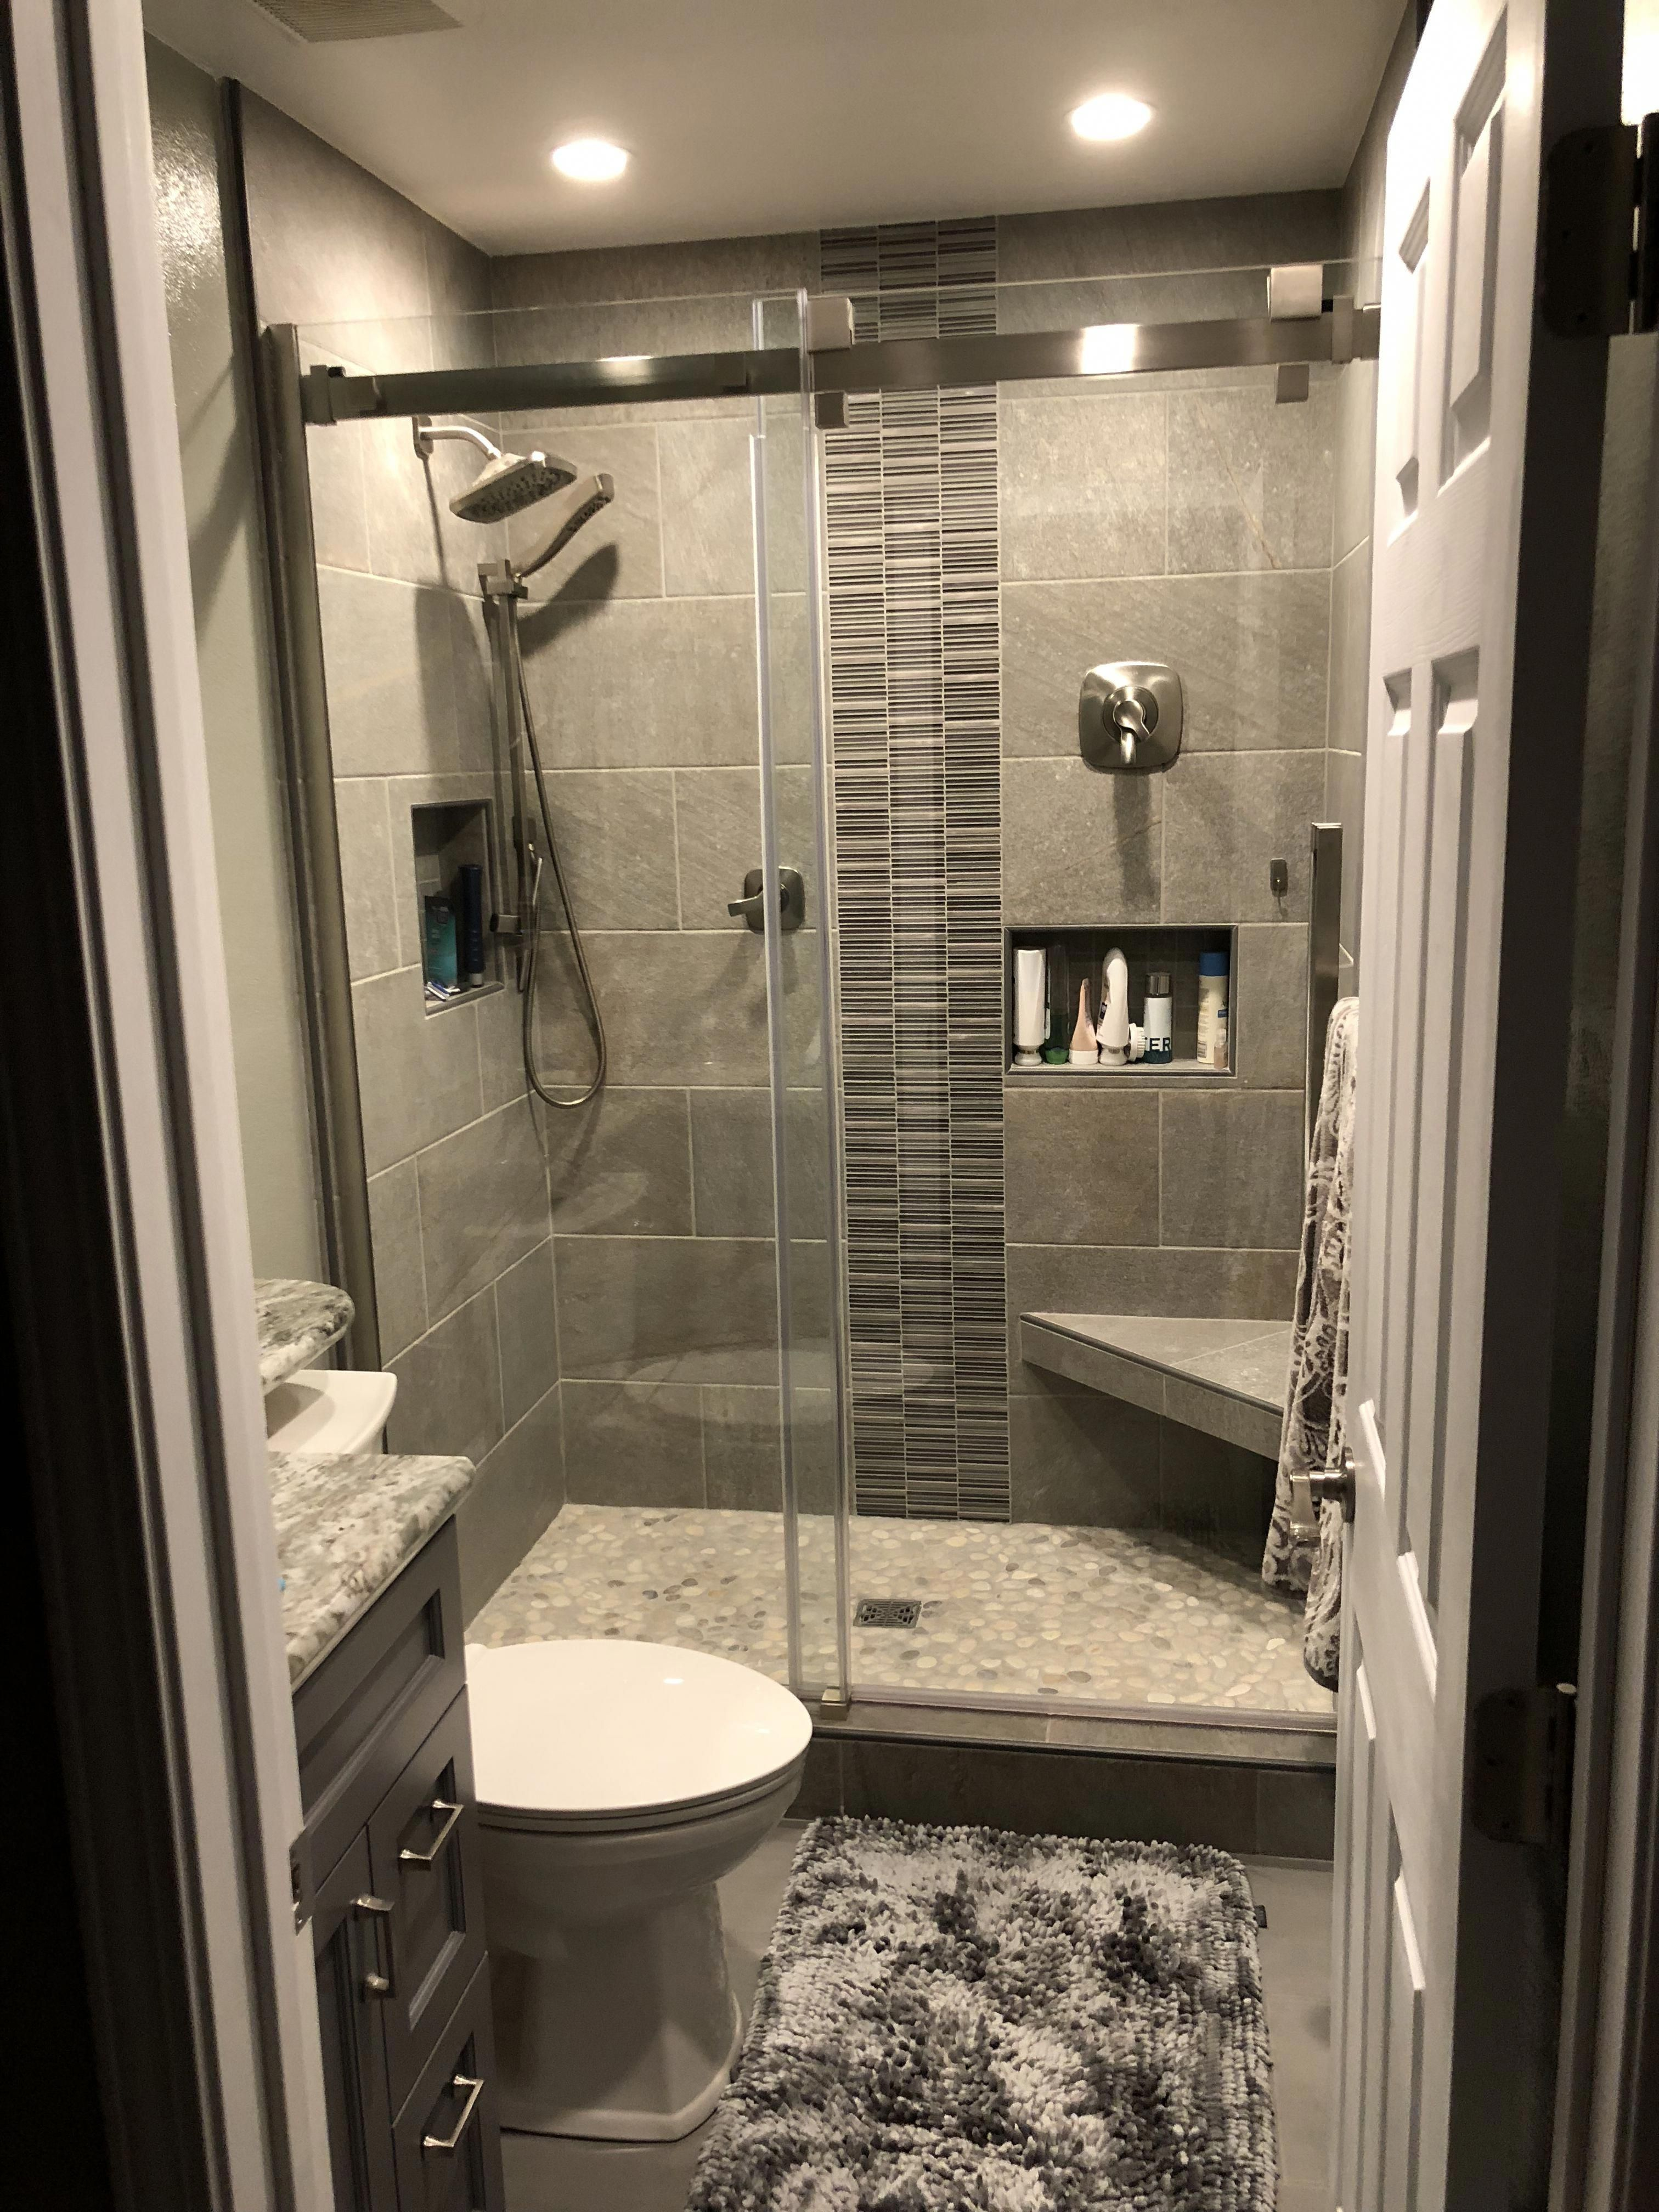 i really like doing this dyi bathroom ideas small on bathroom renovation ideas for small bathrooms id=48017